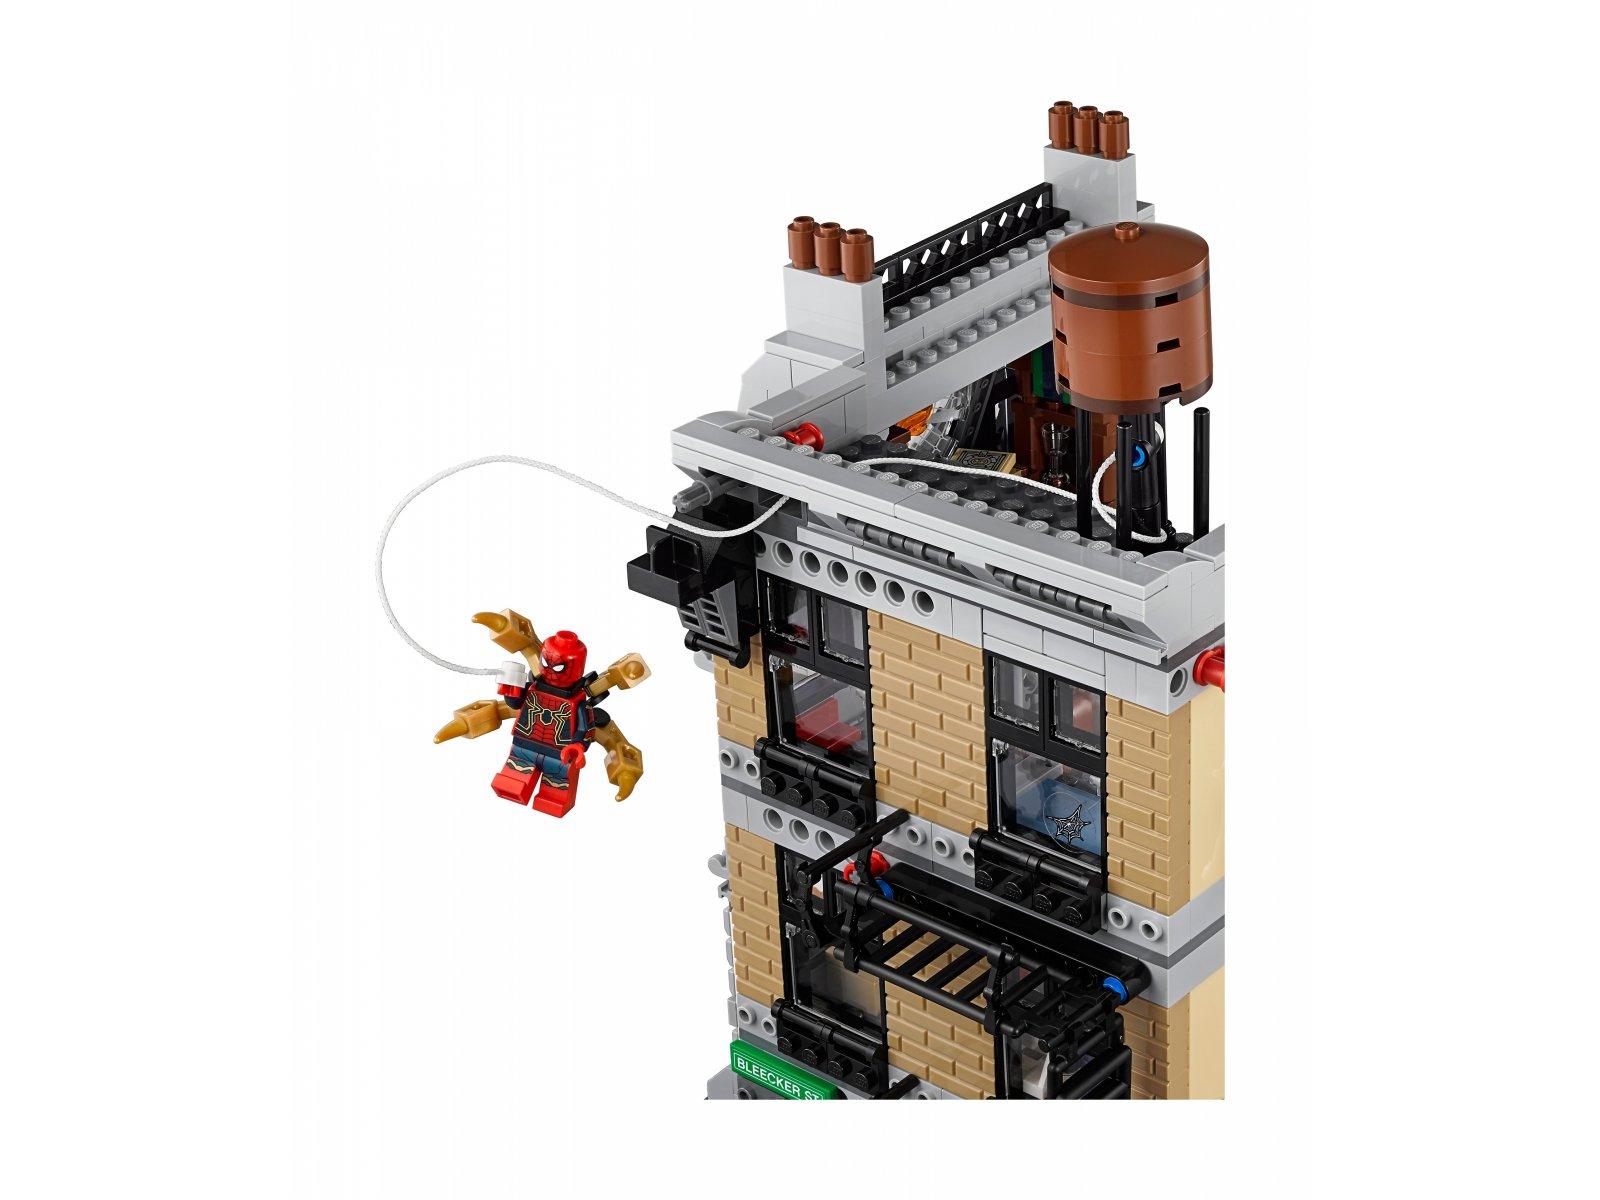 LEGO 76108 Starcie w Sanctum Sanctorum